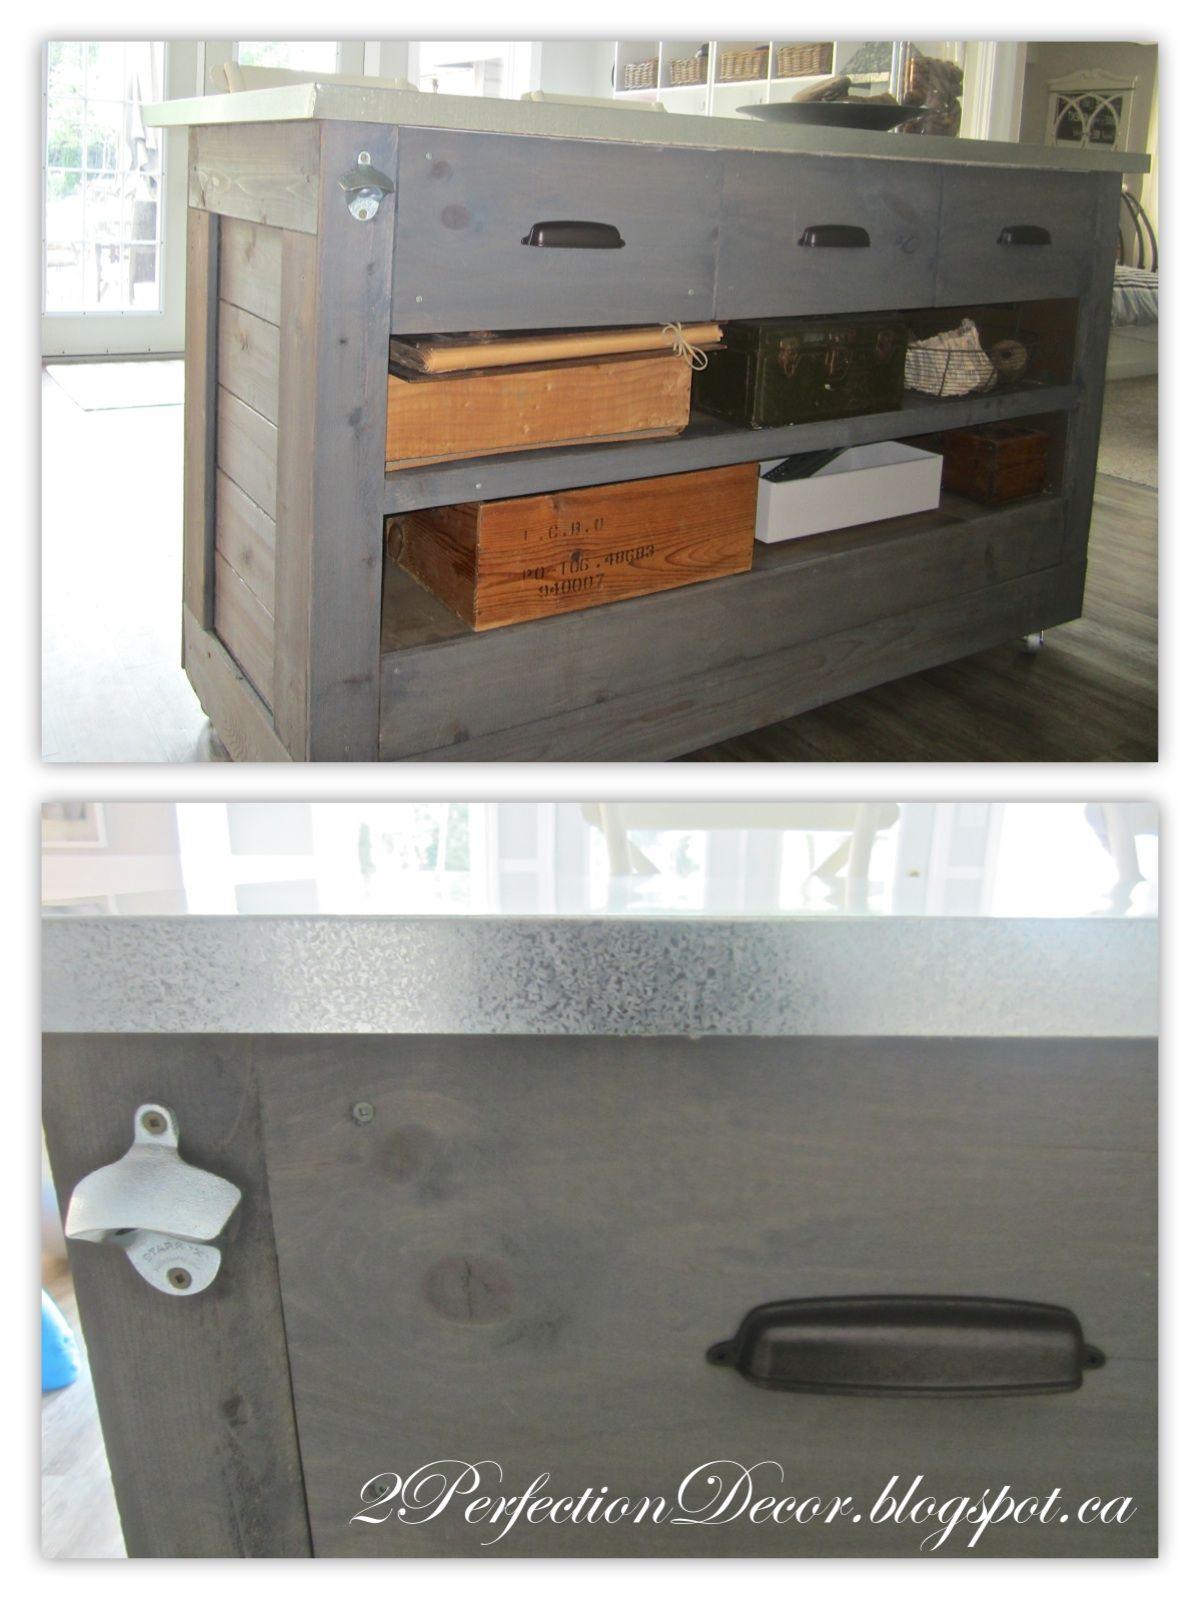 dc1bb6fc1e50ccfd461de4db83e3a827 Frais De Bar De Salon Ikea Concept